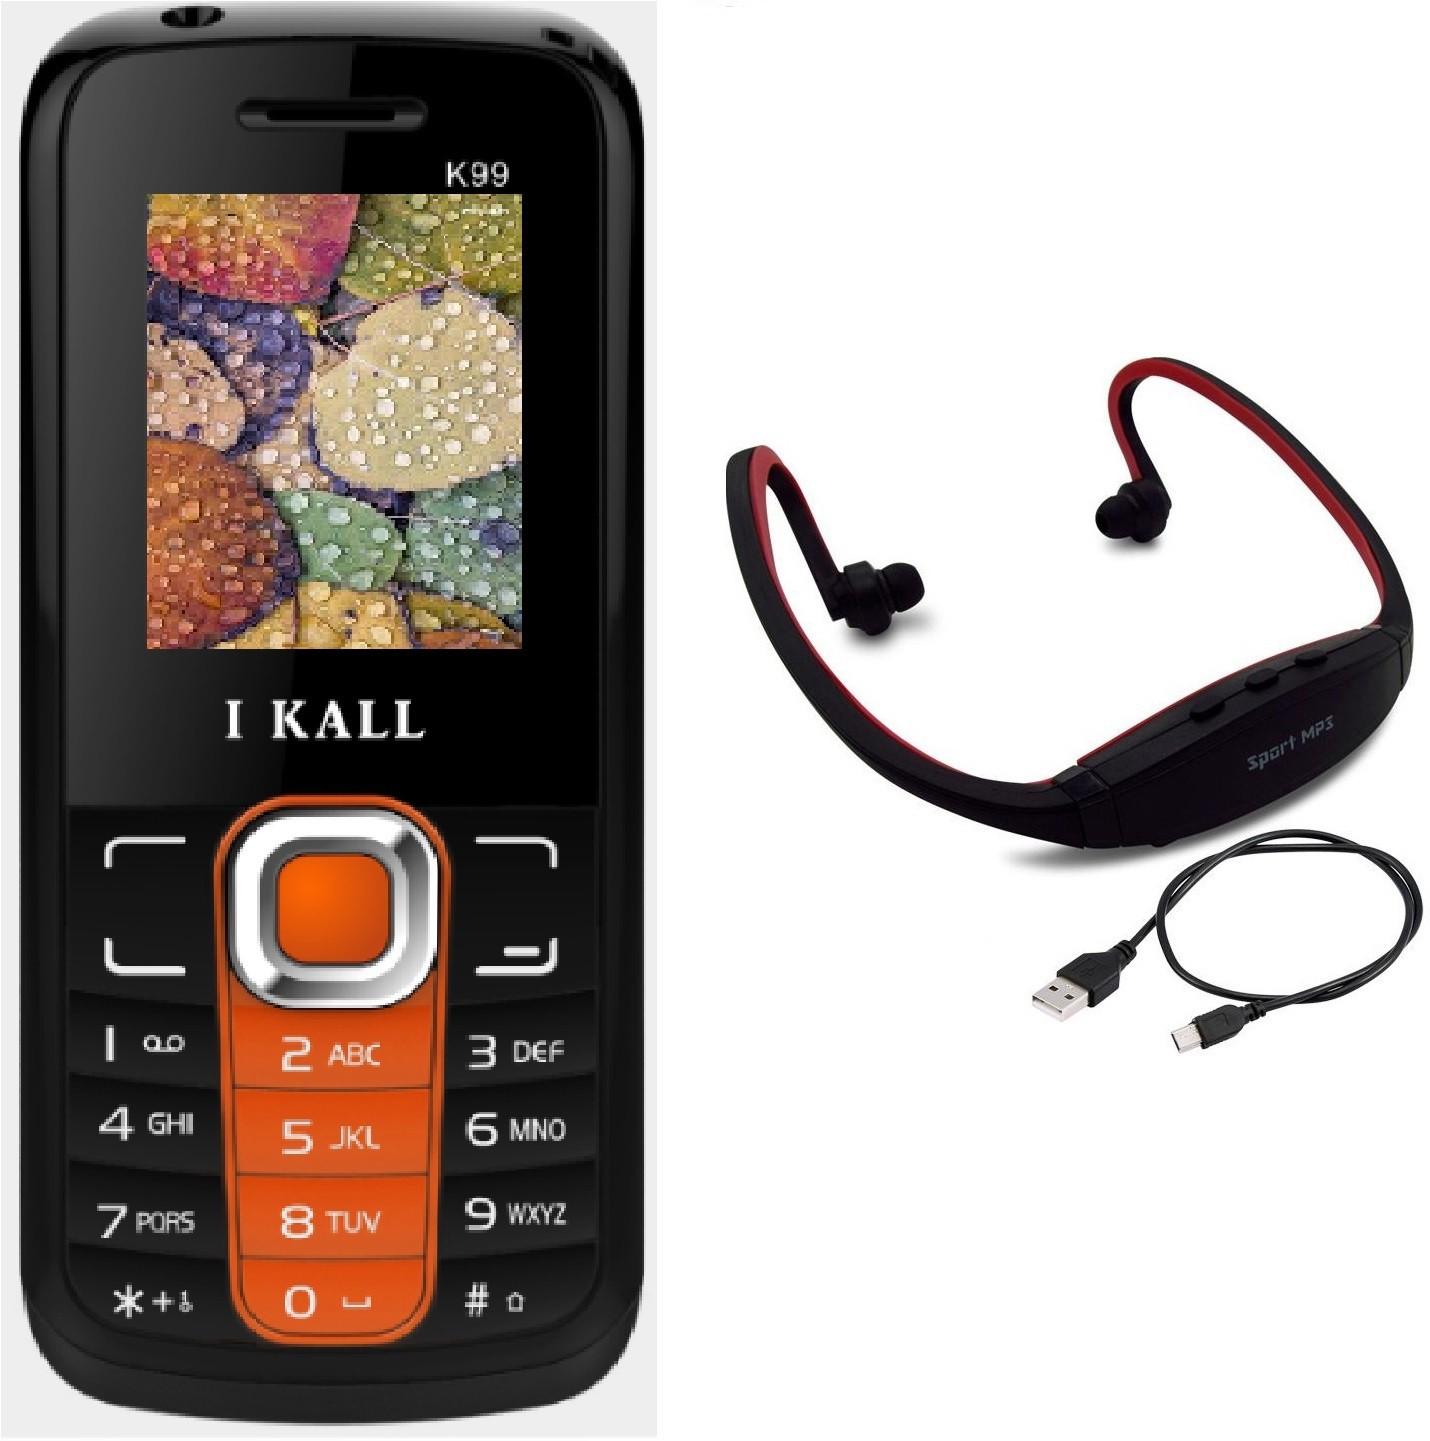 I Kall K99 with MP3/FM Player Neckband(Orange & Black)